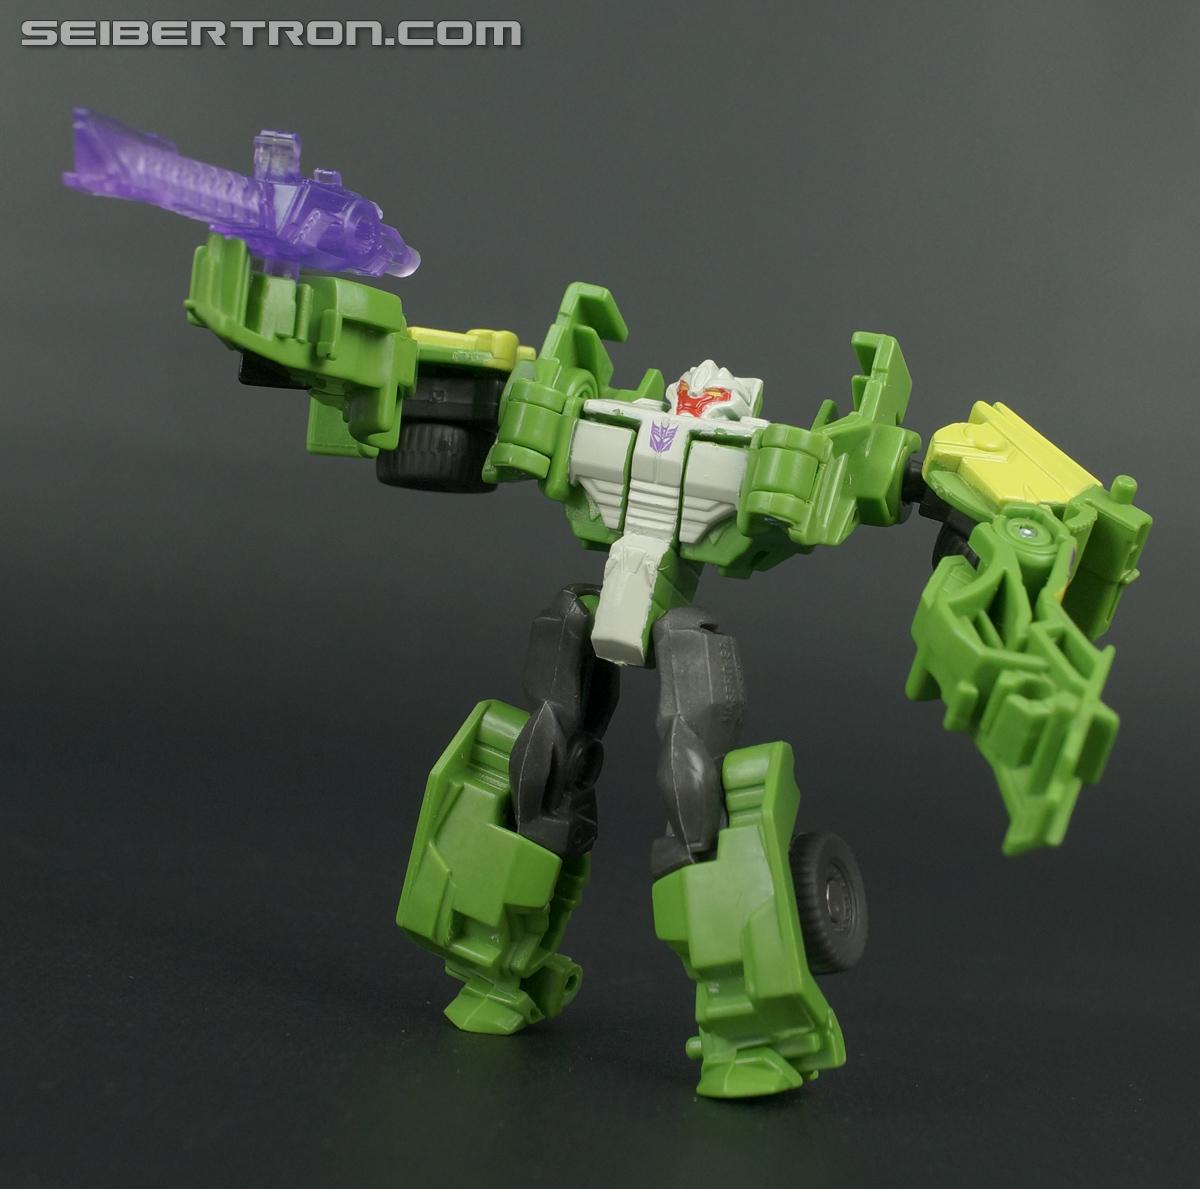 Transformers Prime Beast Hunters Cyberverse Breakdown (Apex Hunter Armor) (Image #76 of 96)